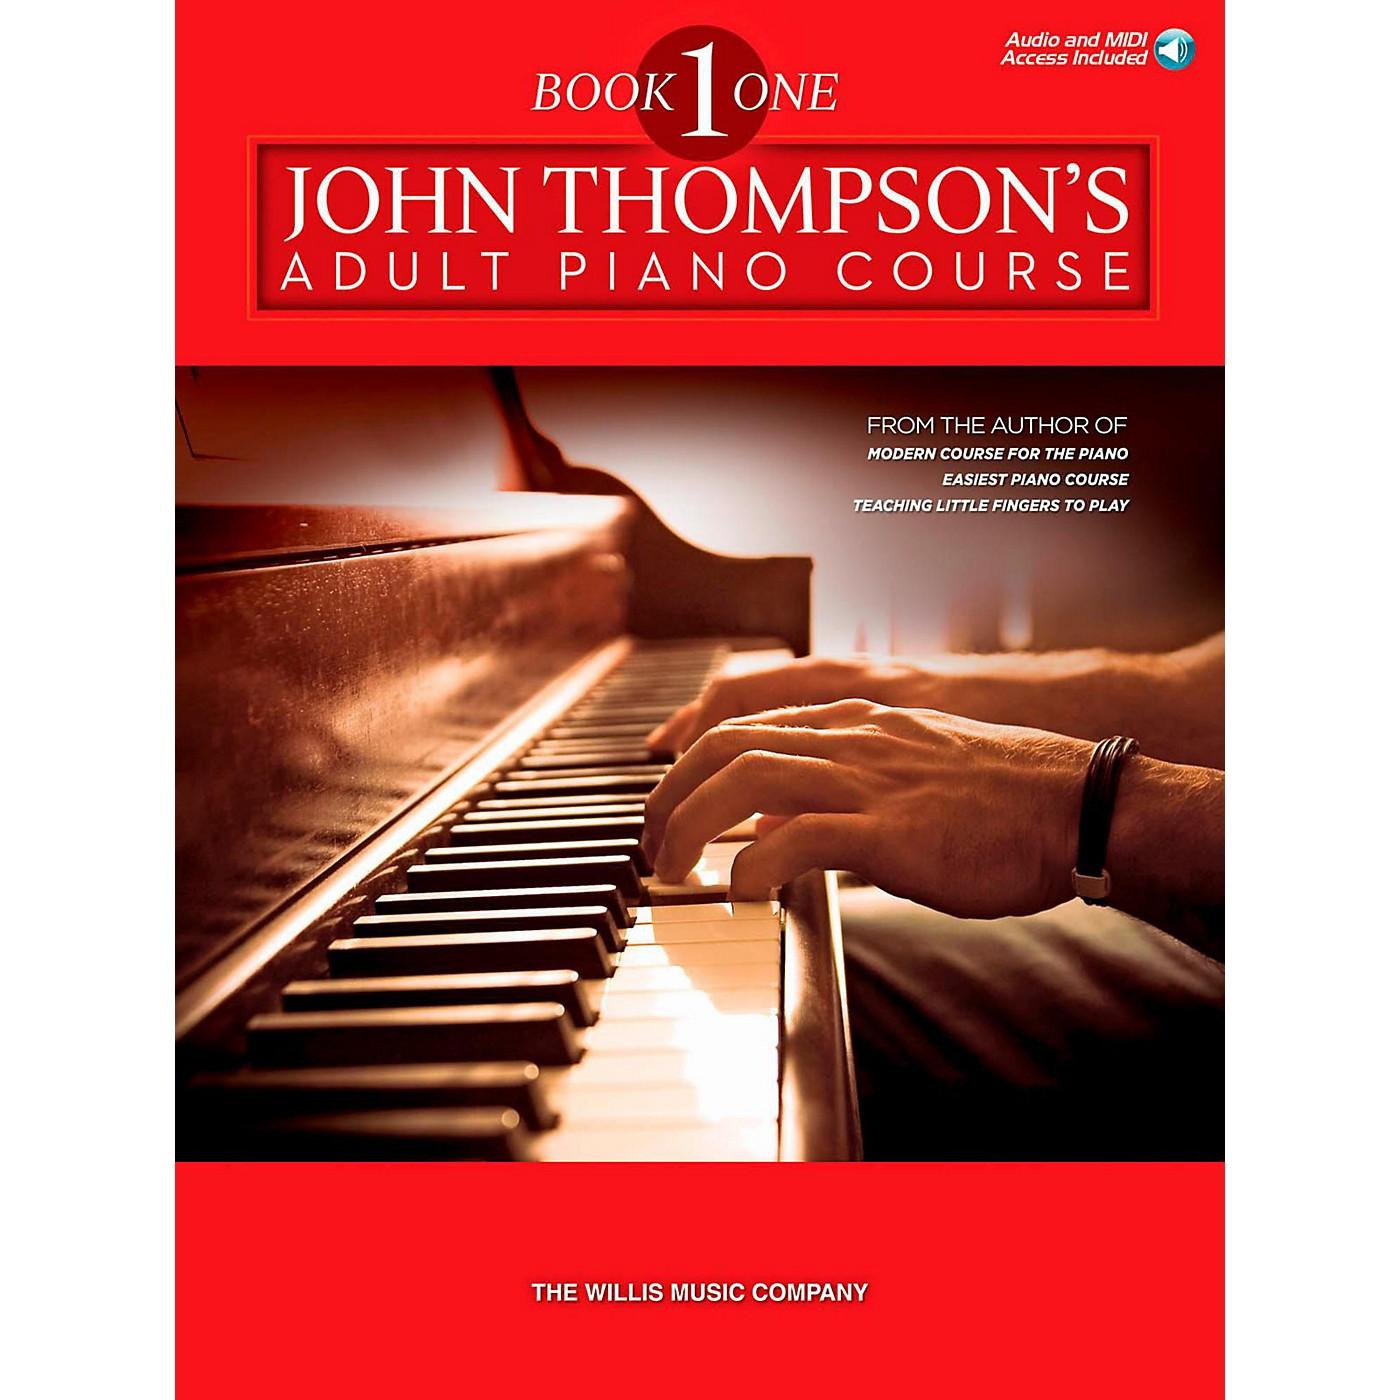 Hal Leonard John Thompson's Adult Piano Course - Book 1 (Book/Audio Online) thumbnail